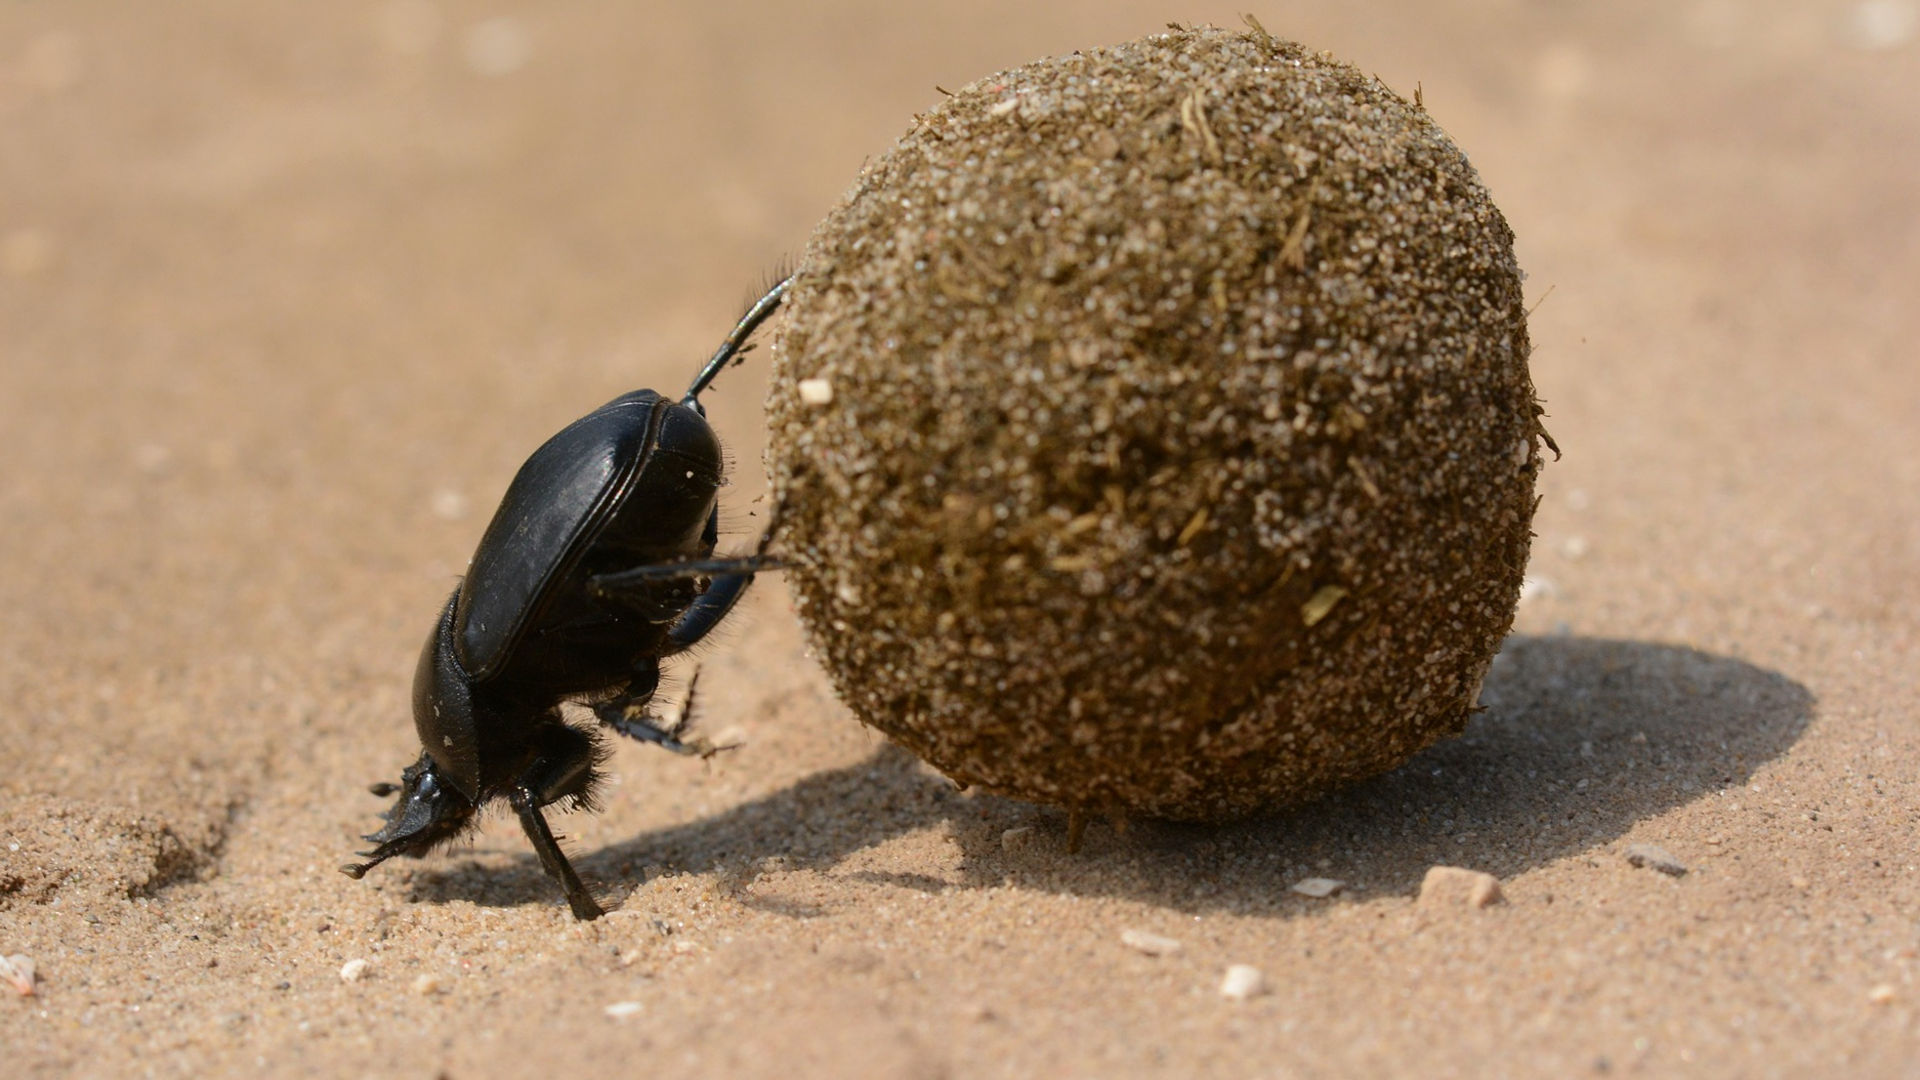 Sisyphean dung beetle. Photo credit: Topi_Pigula on Pixabay.